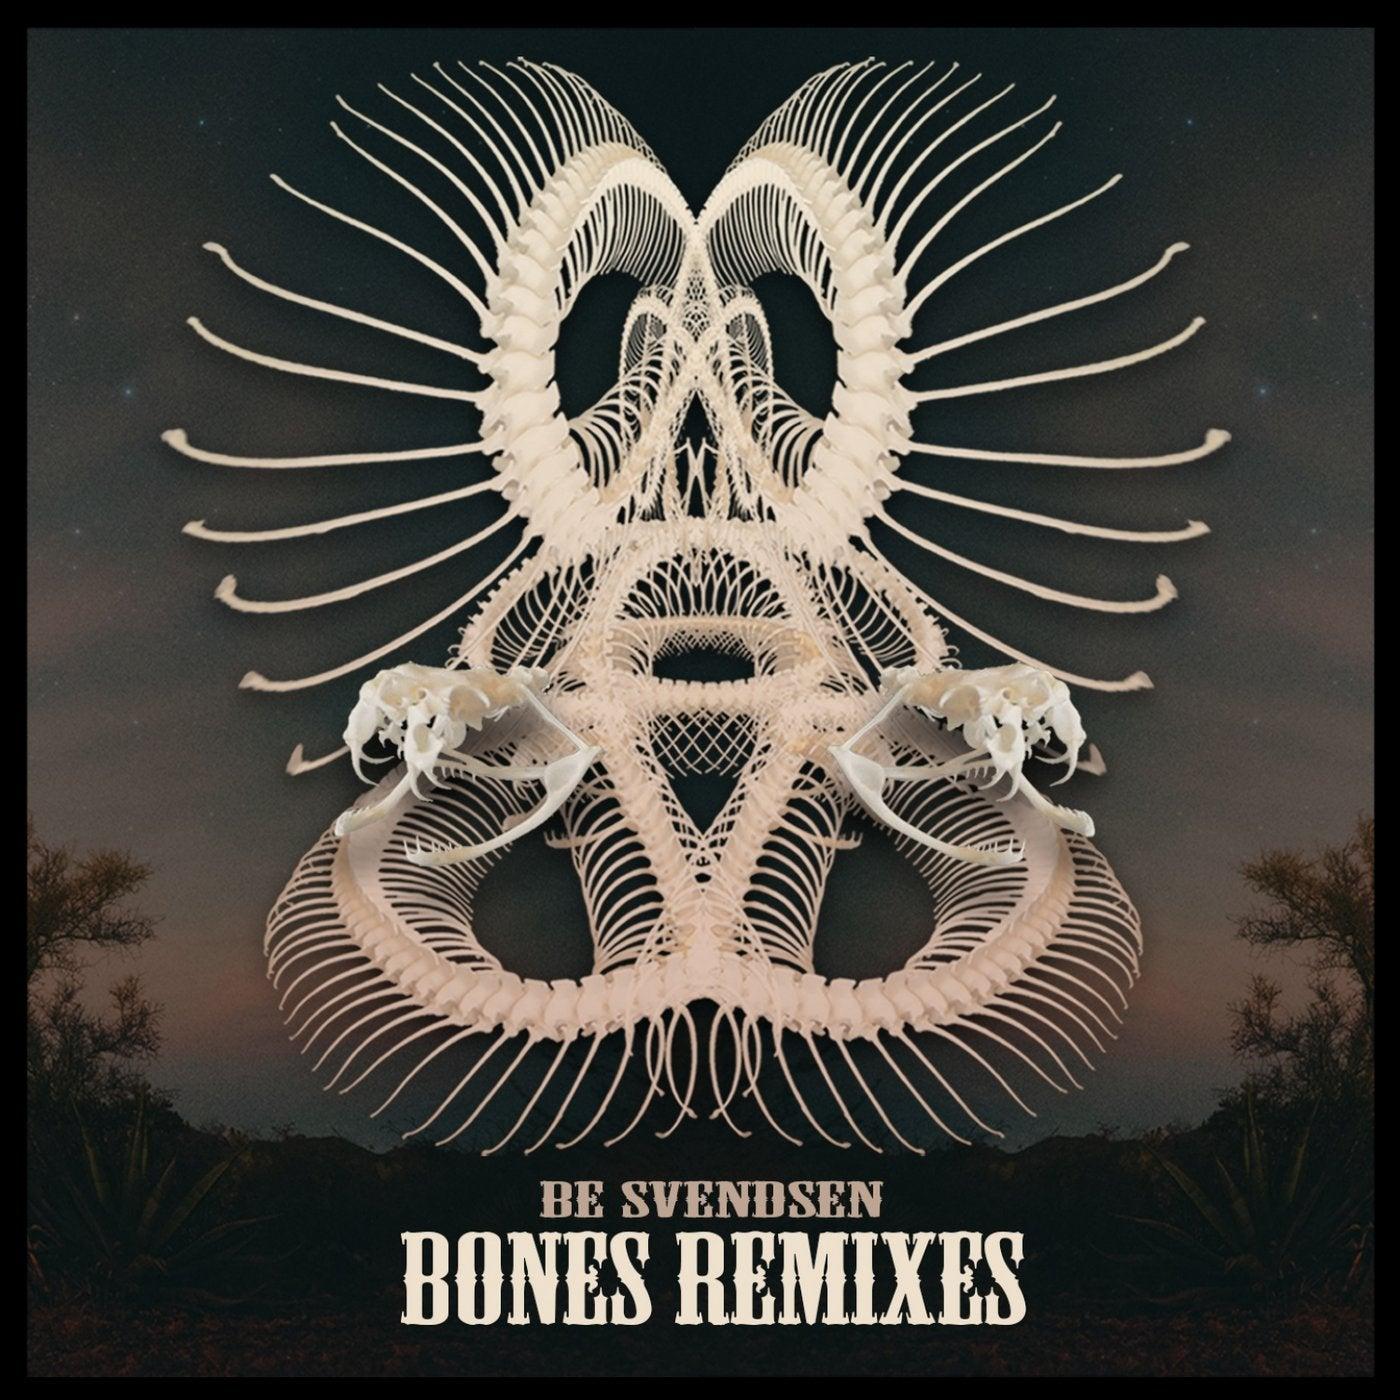 Bones (Be Svendsen's Rodeo Rerub)